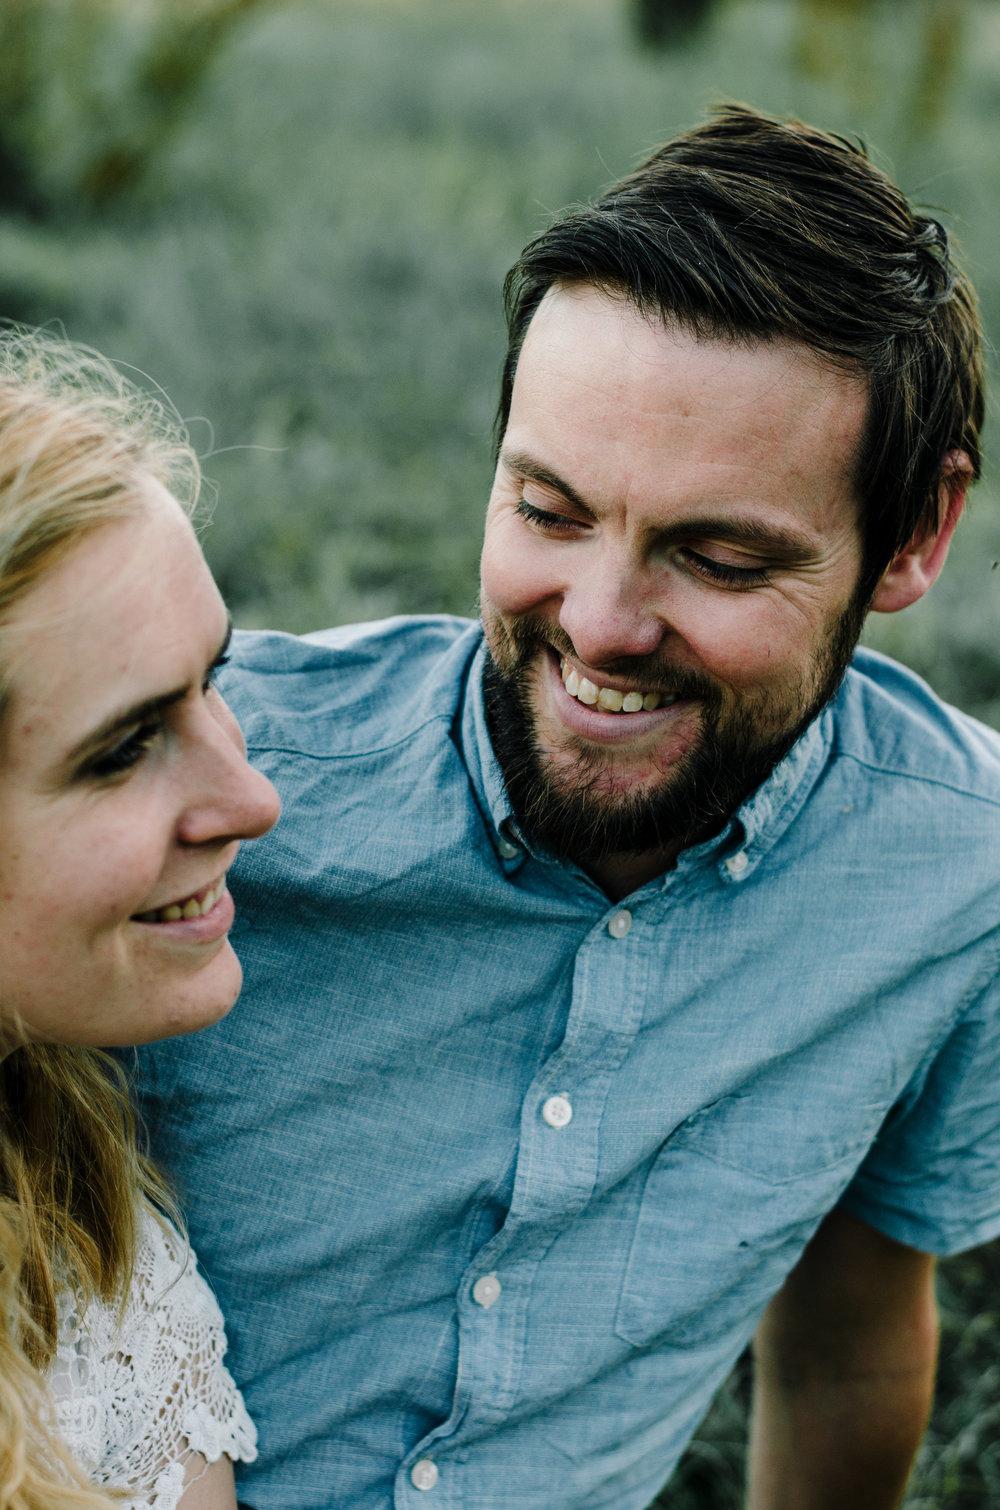 Gina & Chris - Barcombe Mills - Couple Session - Aiste Saulyte Photography-70.jpg